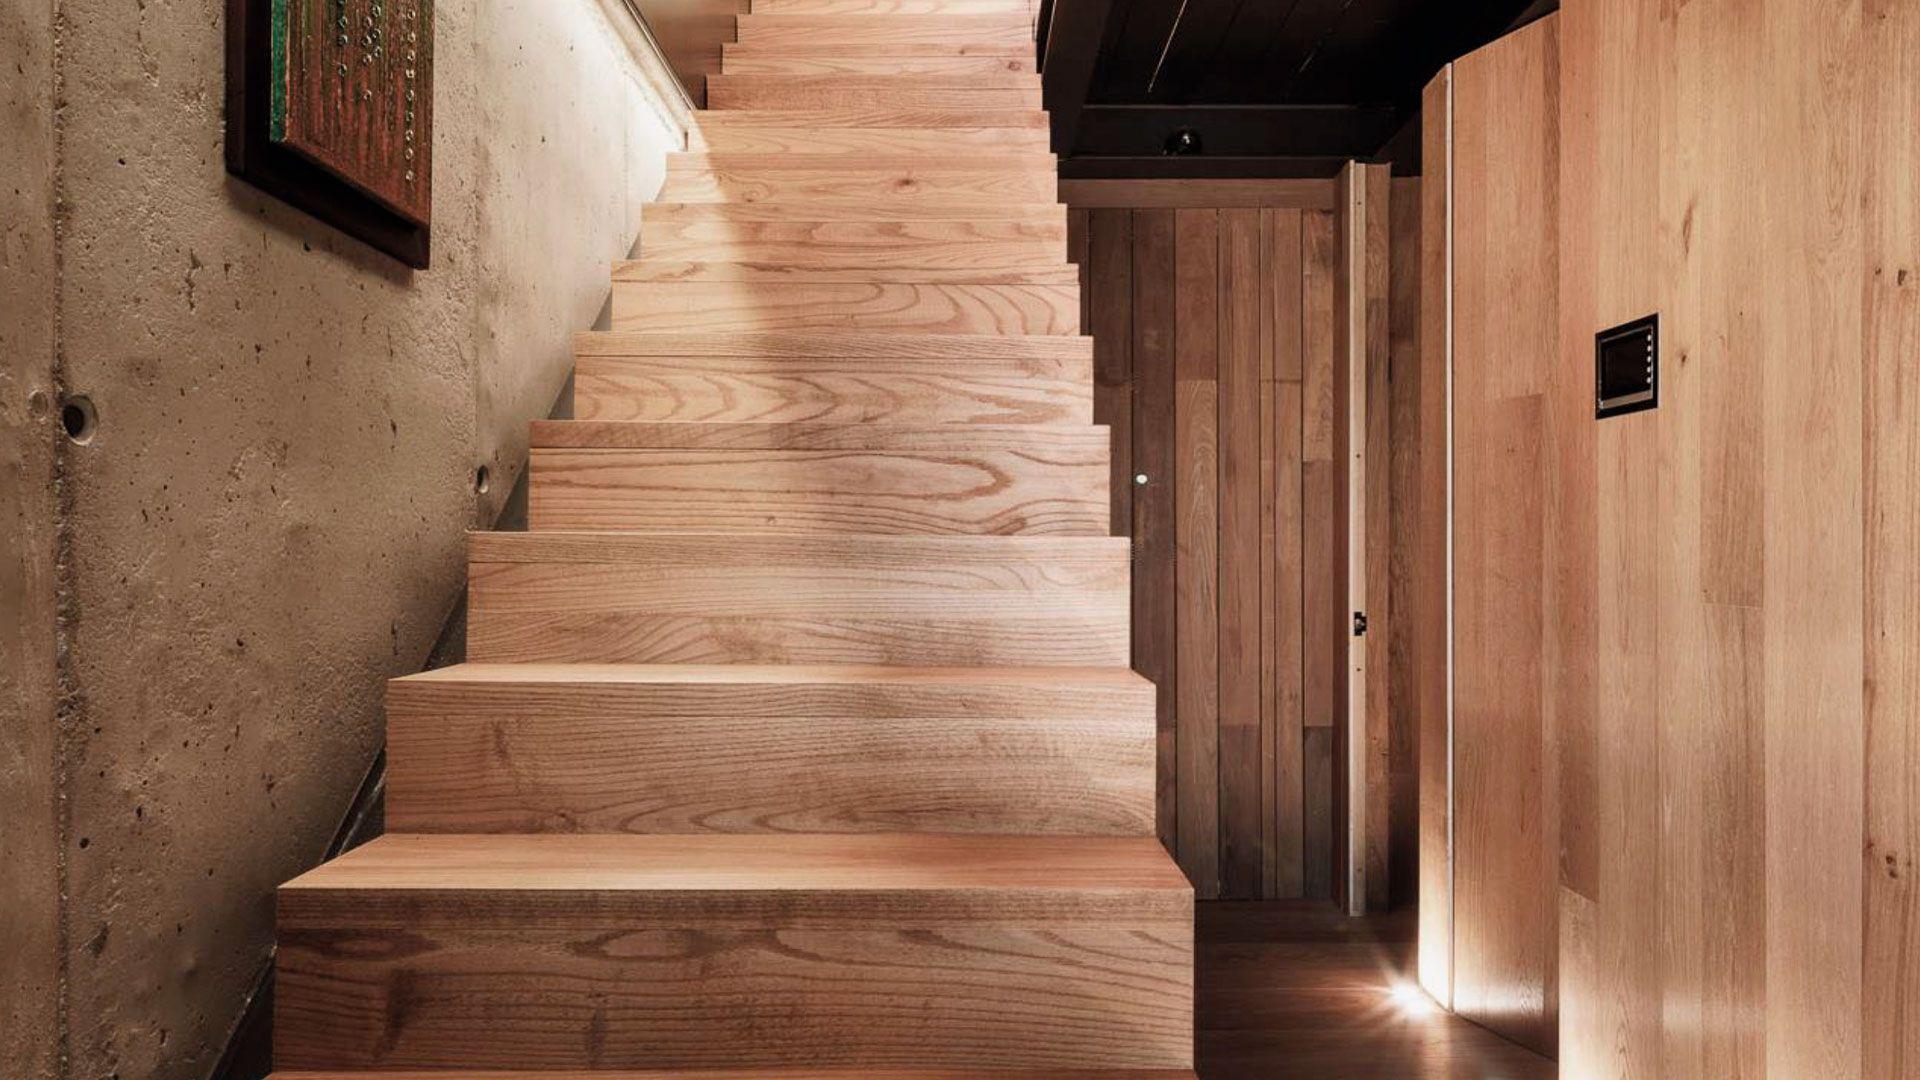 Escaleras de madera natural